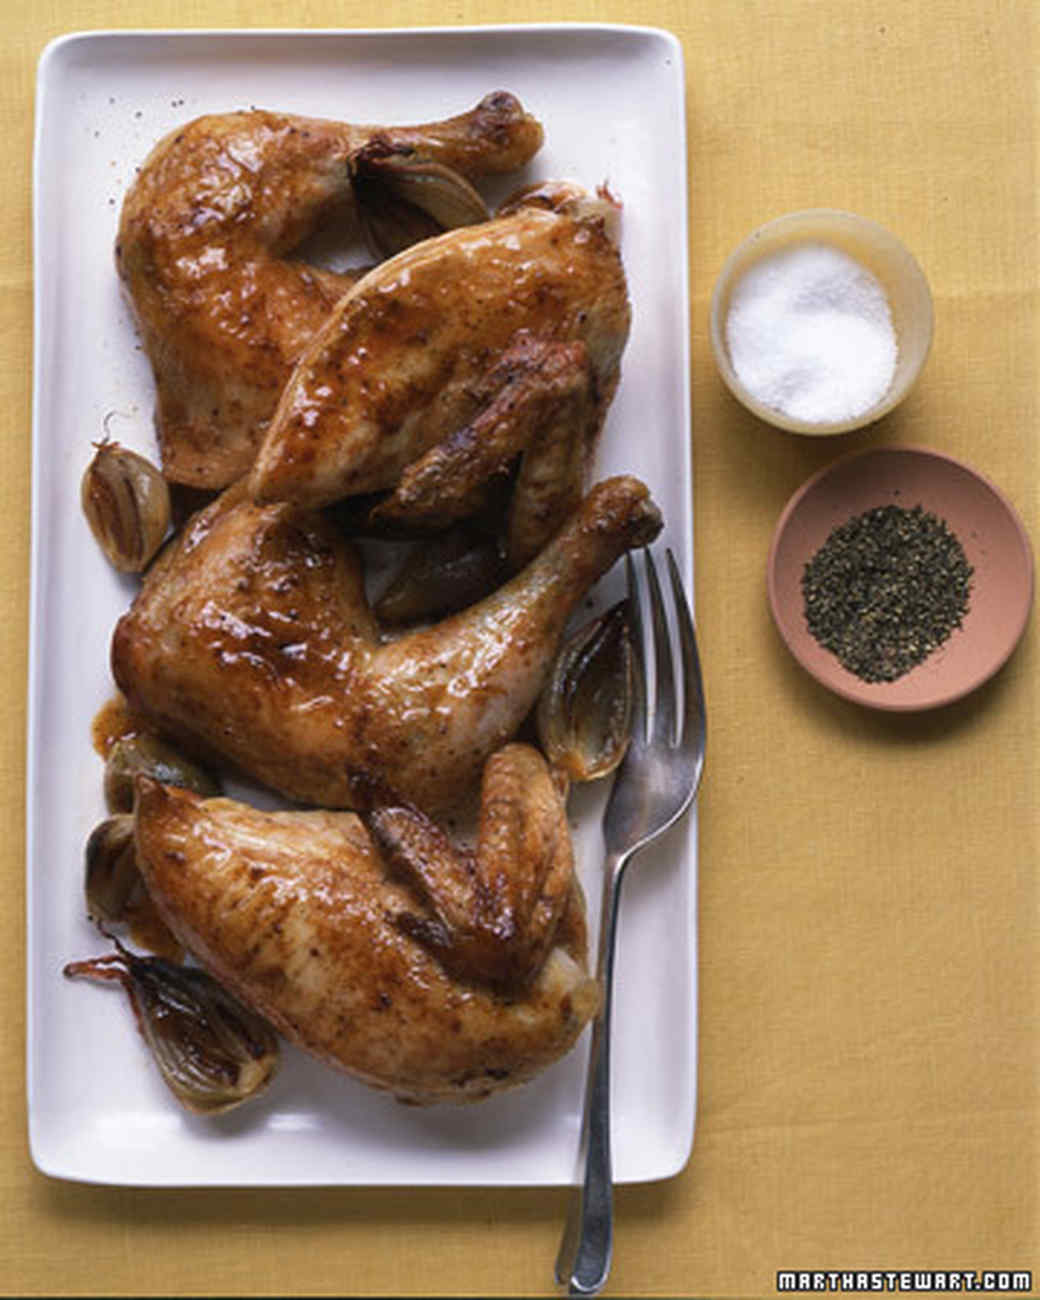 msl_sept06_qc_chicken.jpg